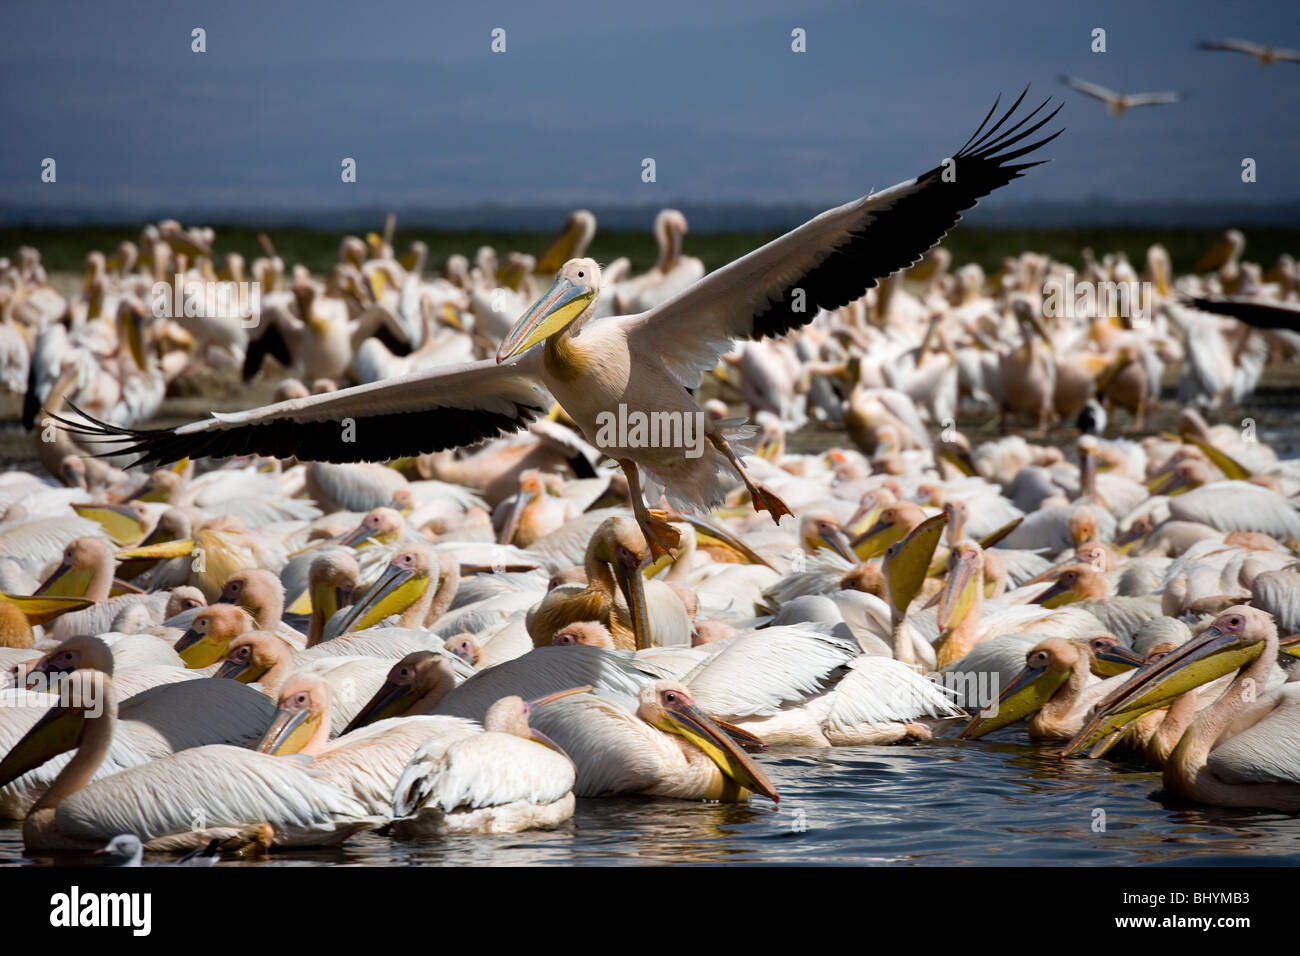 Gran pelícano blanco NP, el Lago Nakuru, Kenya, Africa Oriental Imagen De Stock